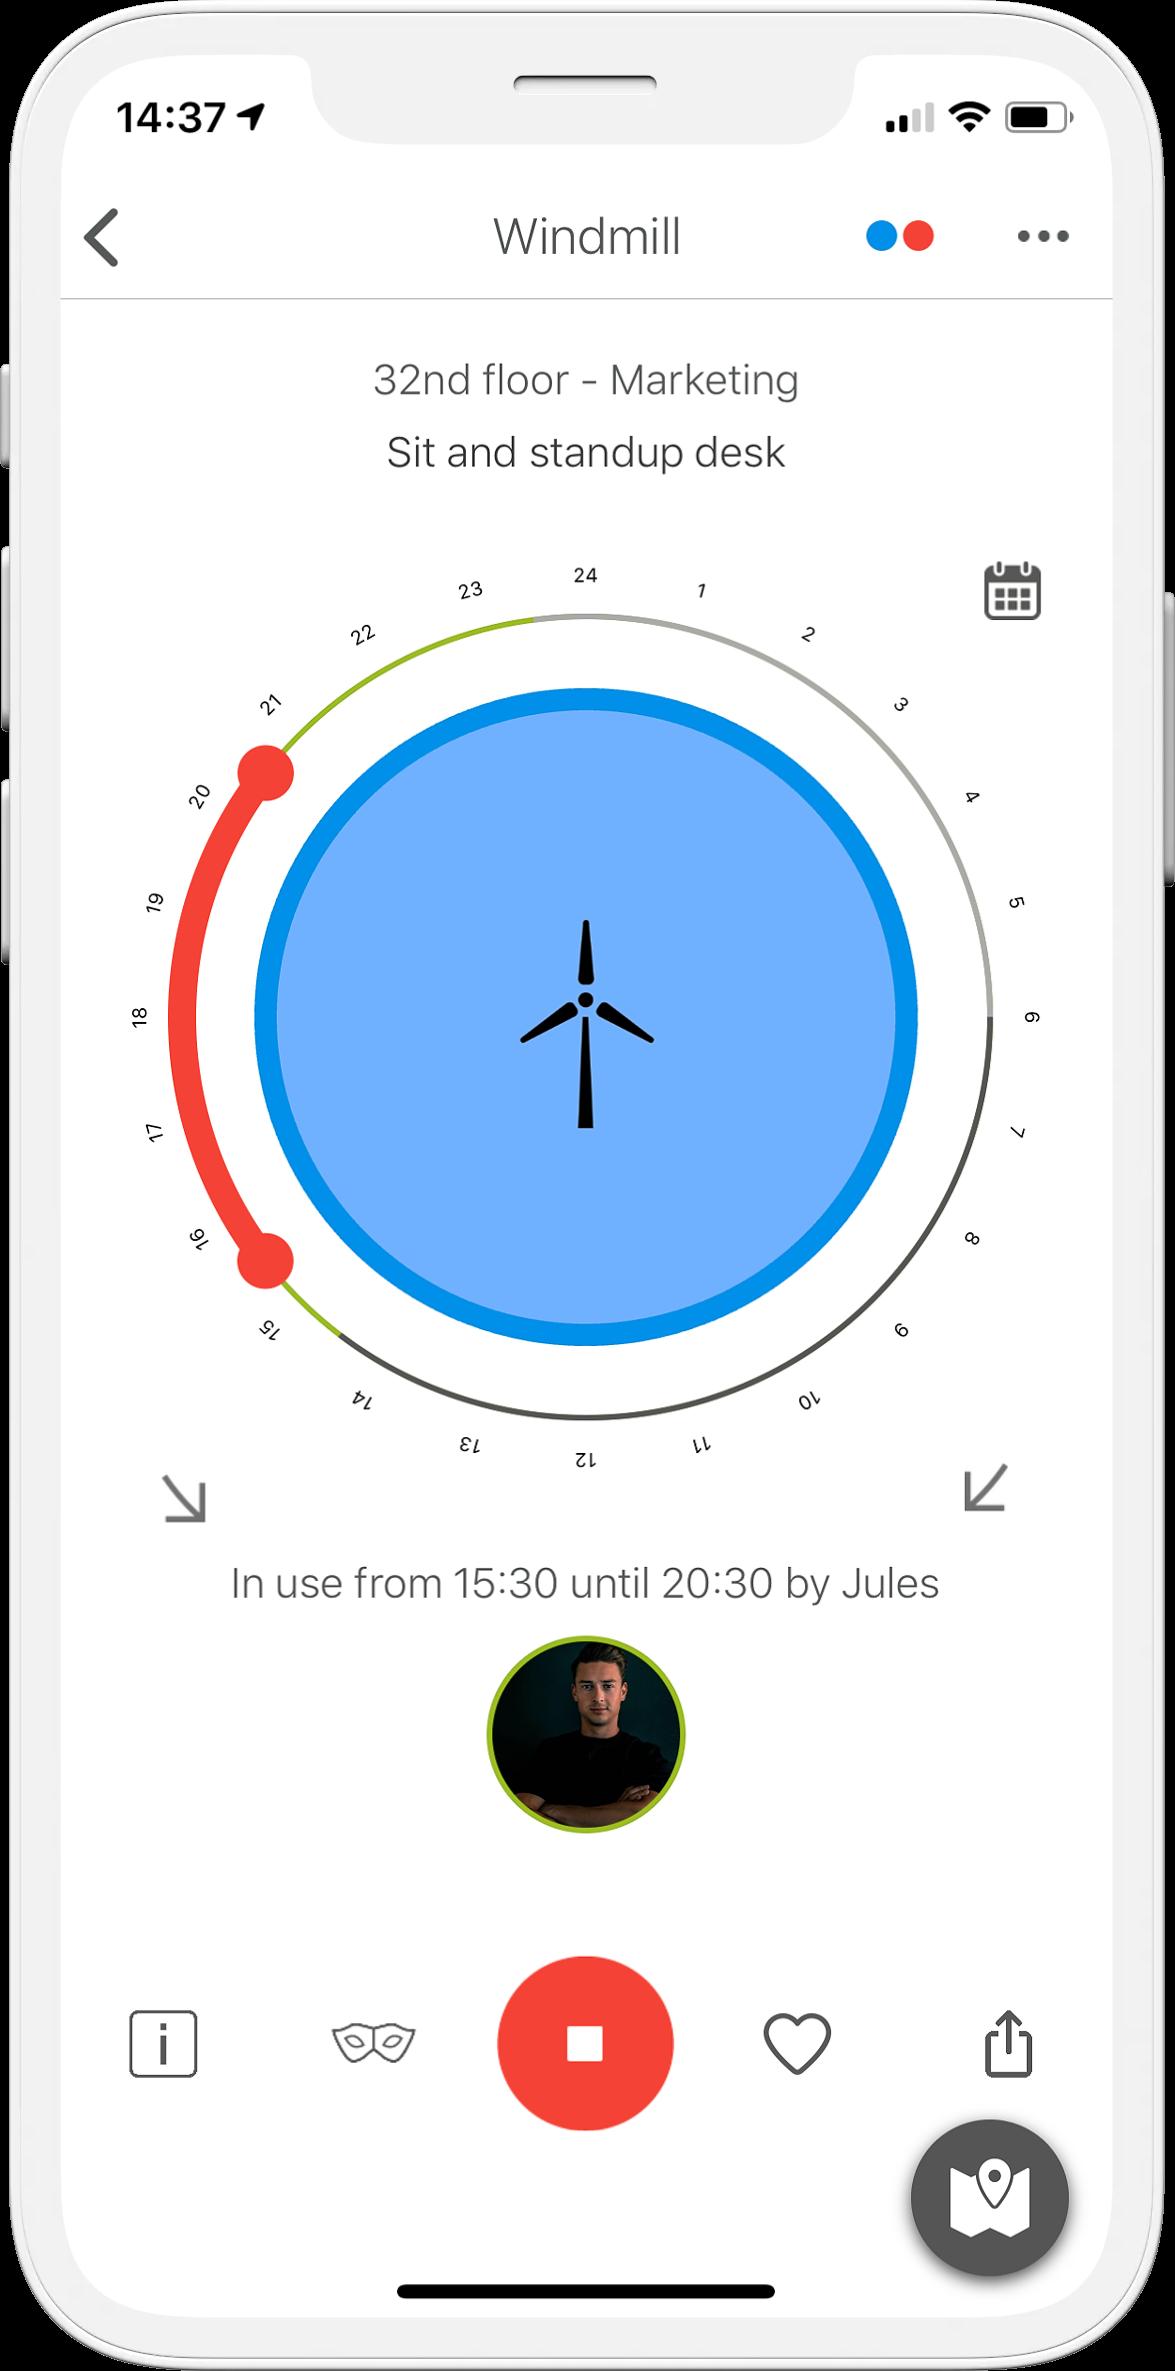 Iotspot smart workspace platform booking app.